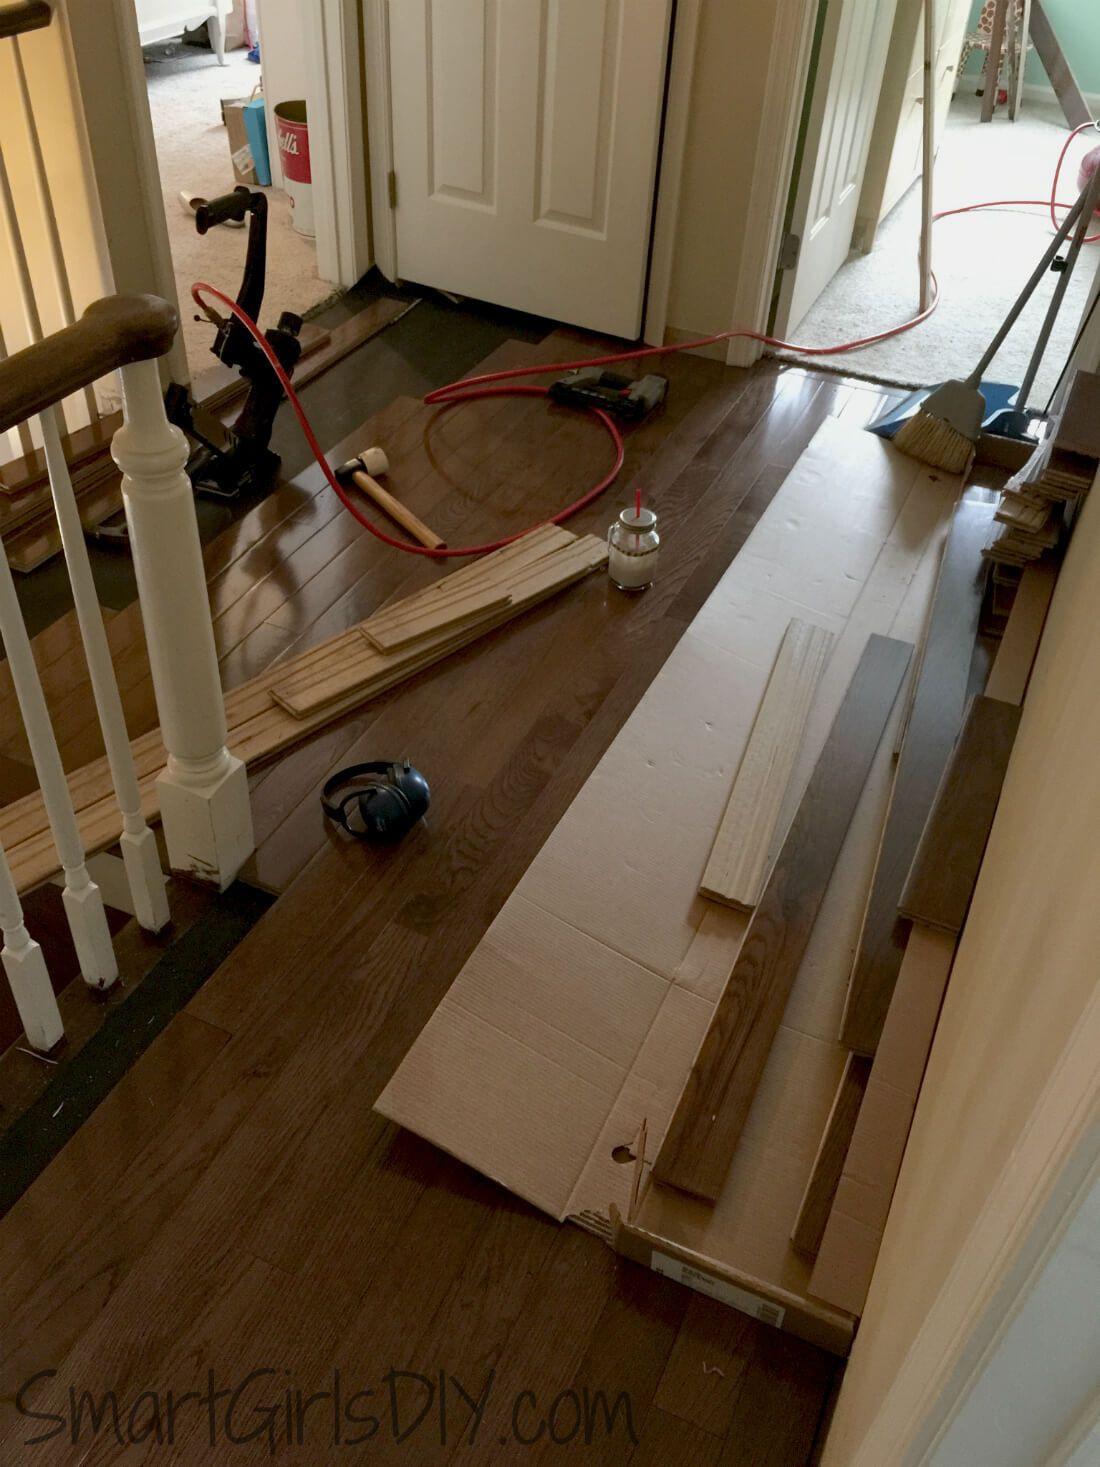 9 16 hardwood flooring of upstairs hallway 1 installing hardwood floors with regard to how to install hardwood floor all by yourself